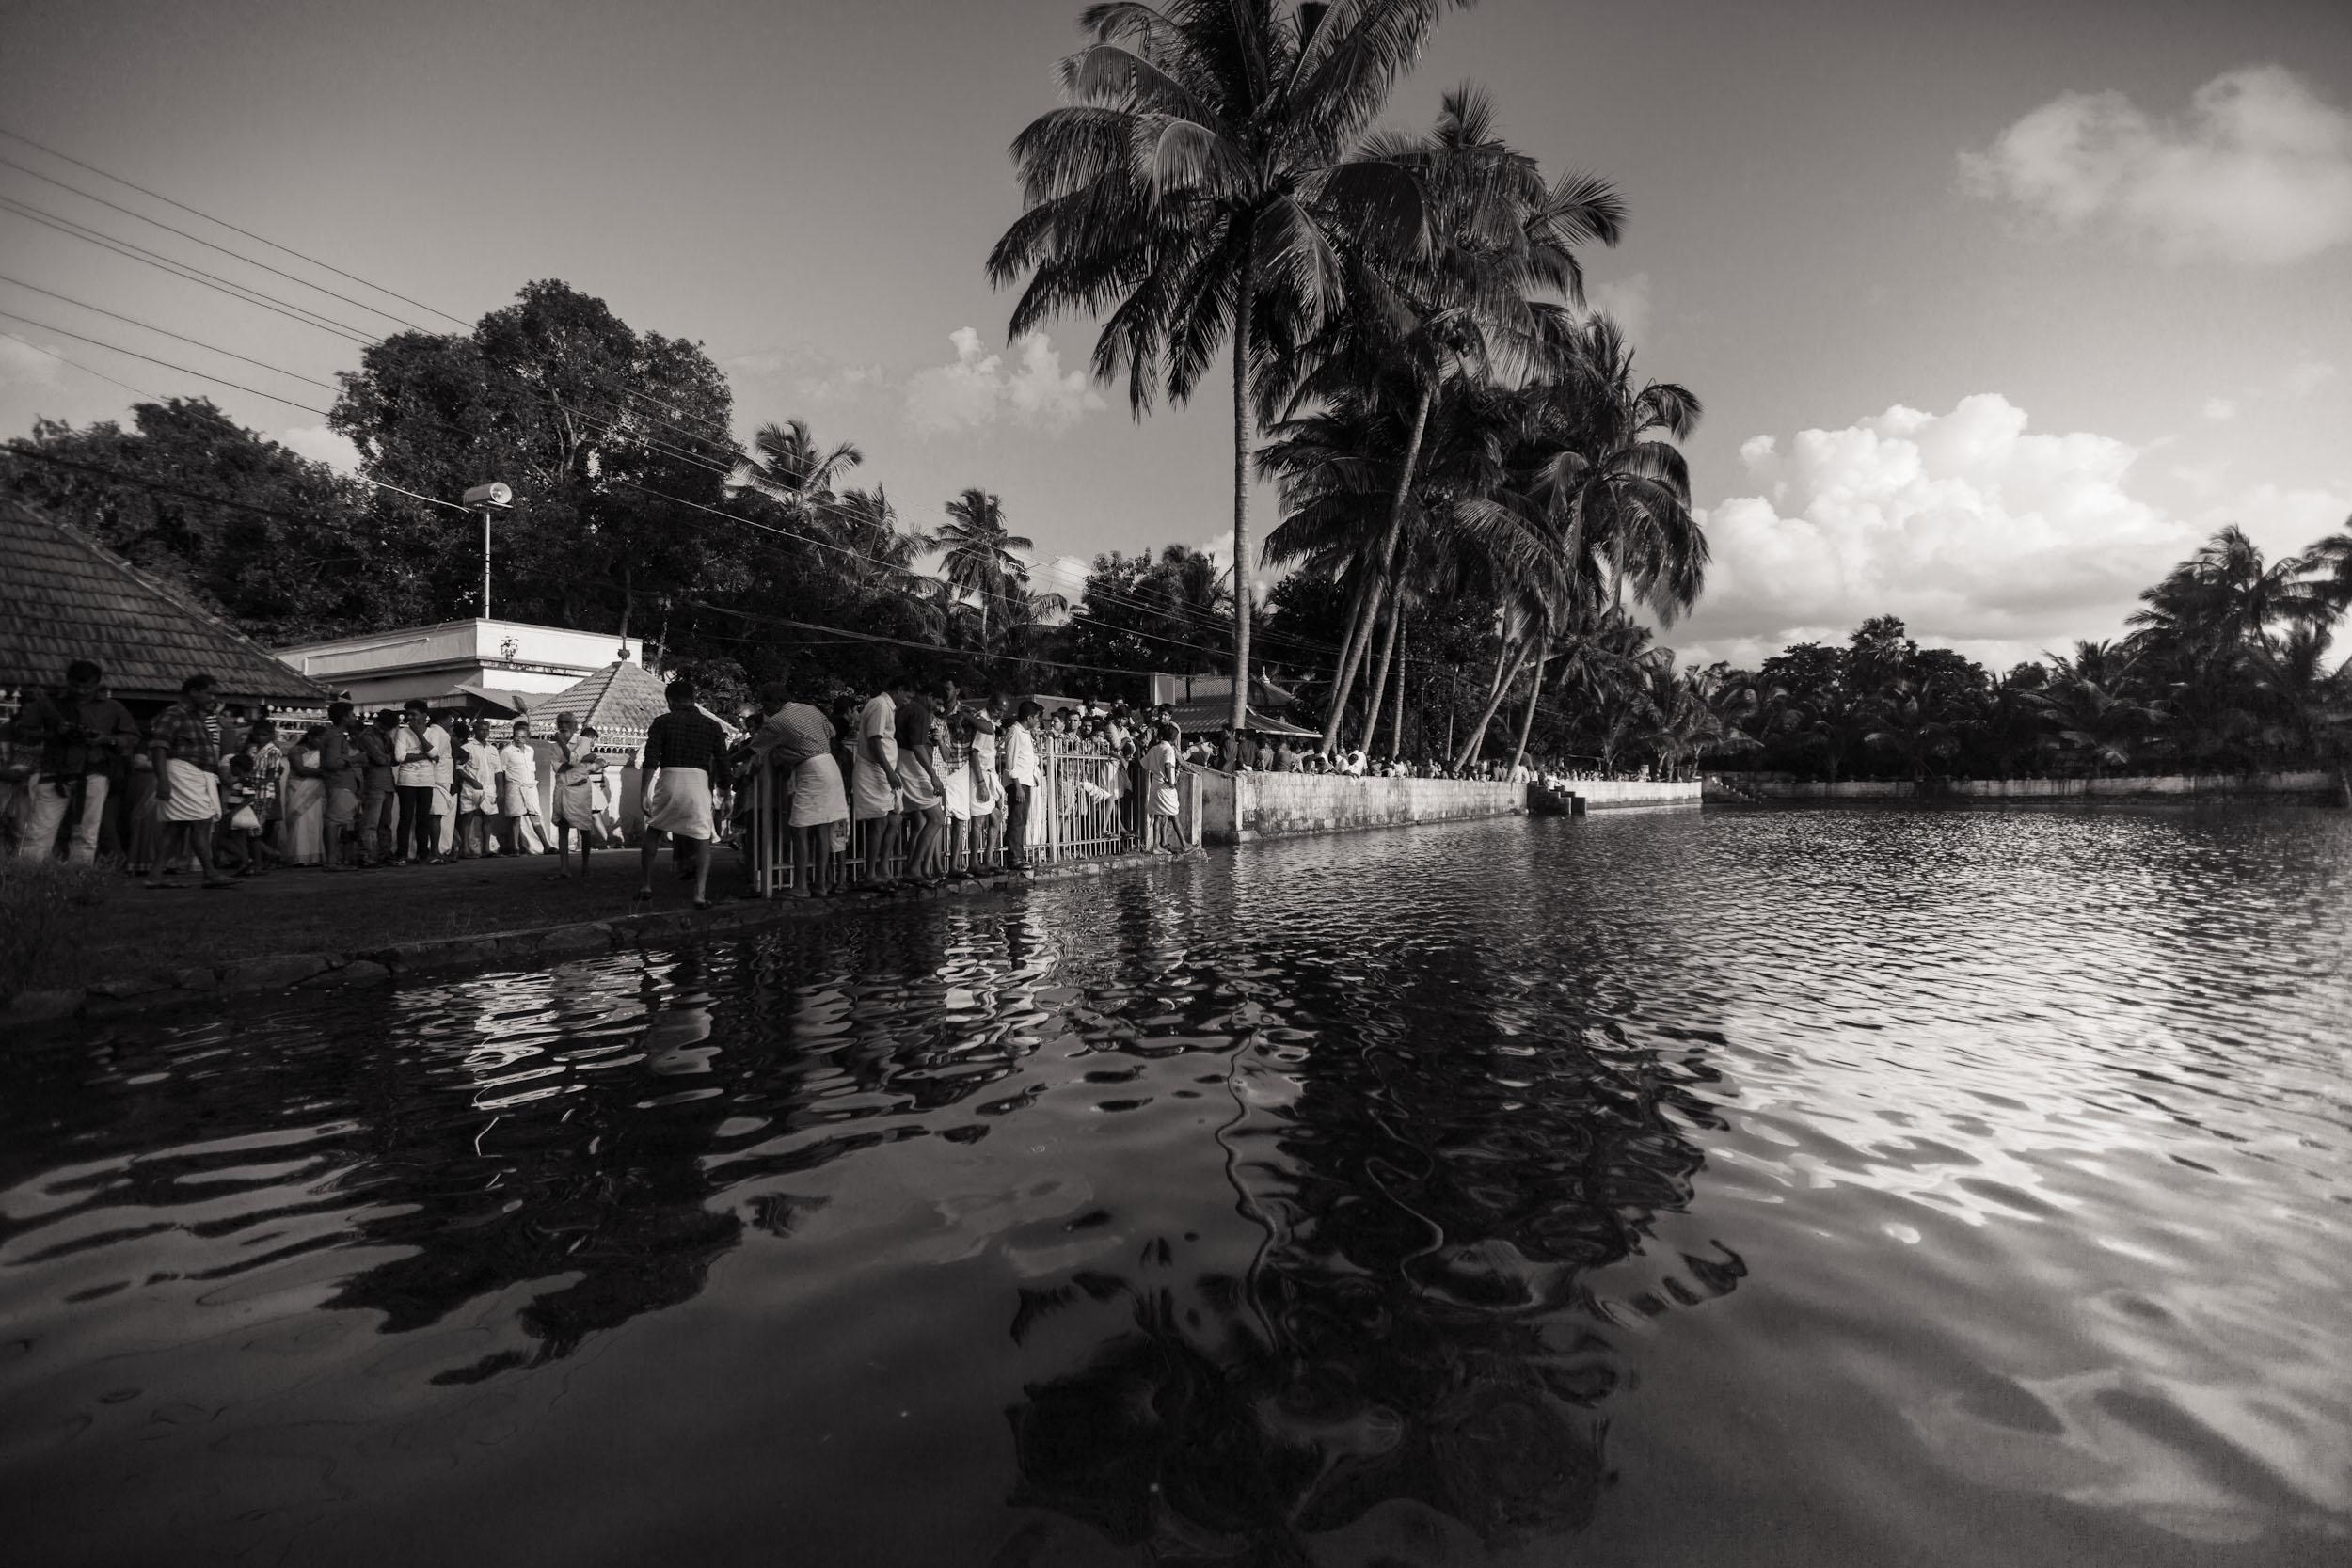 Sindhur_Photography_Travel_People_Kerala-12.JPG